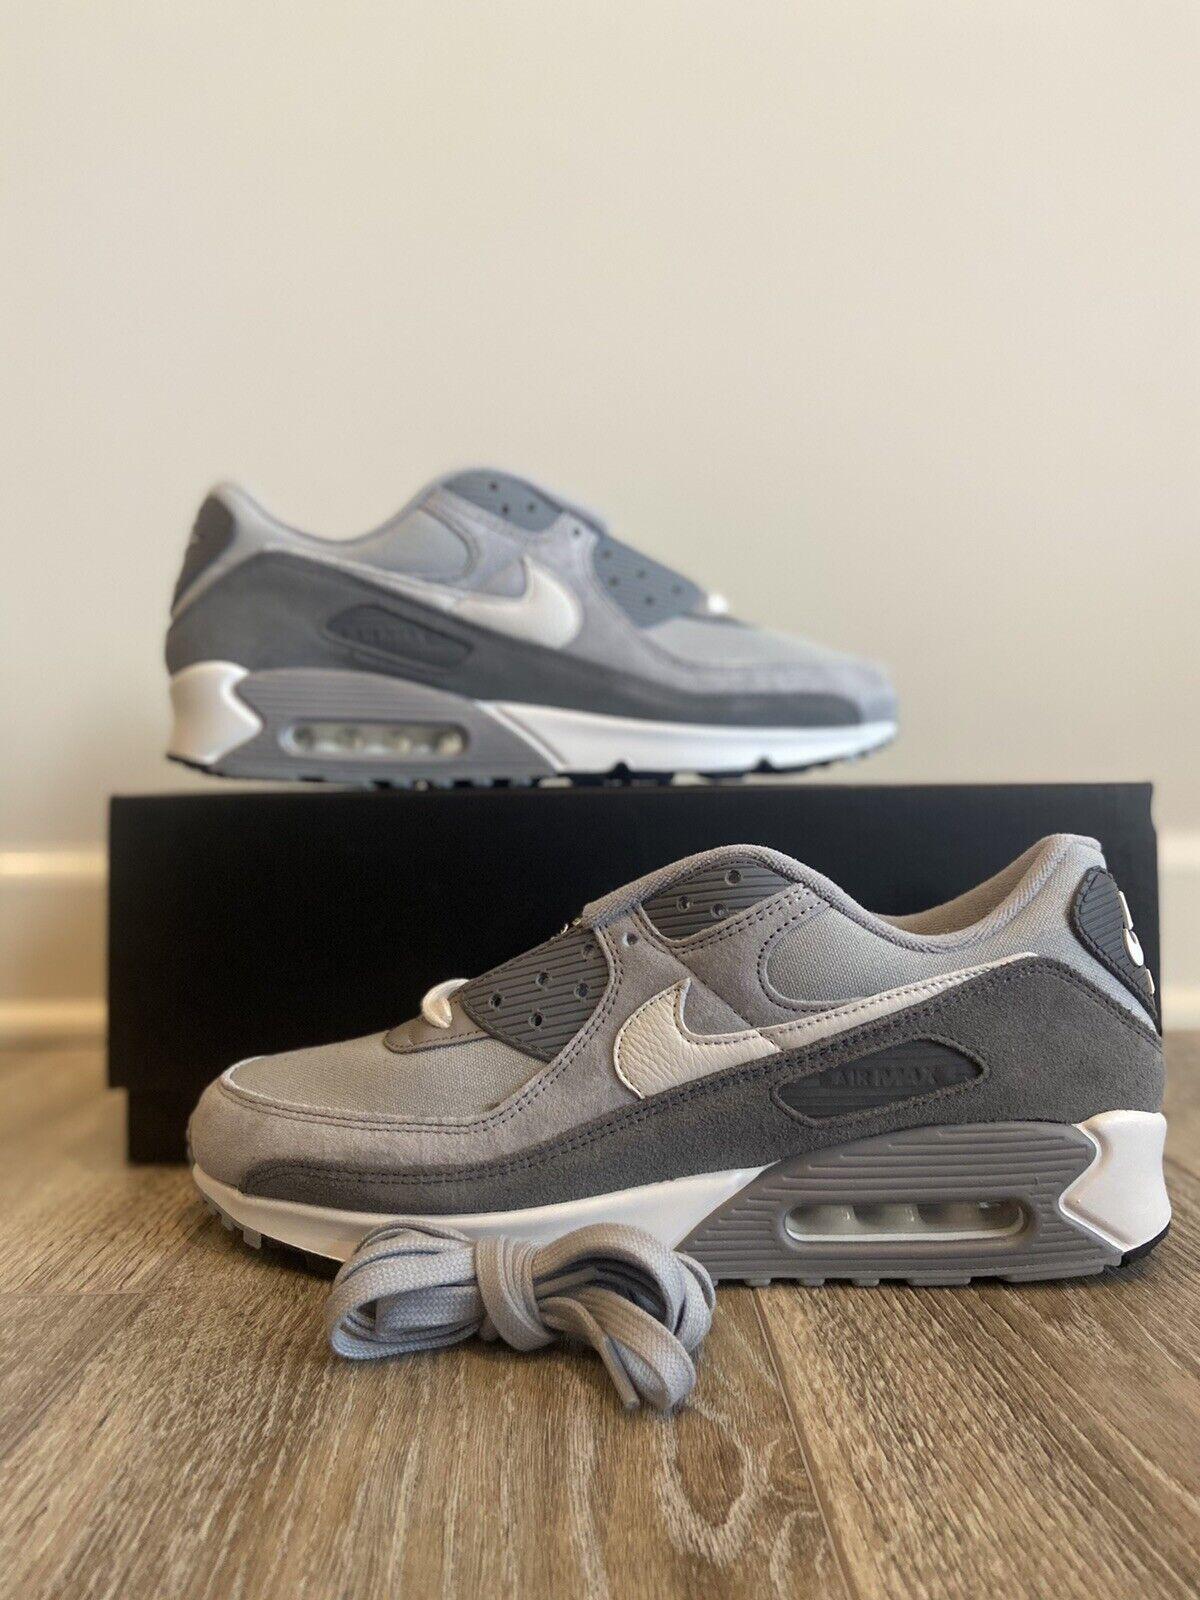 Size 8.5 - Nike Air Max 90 Premium Light Smoke Gray for sale ...